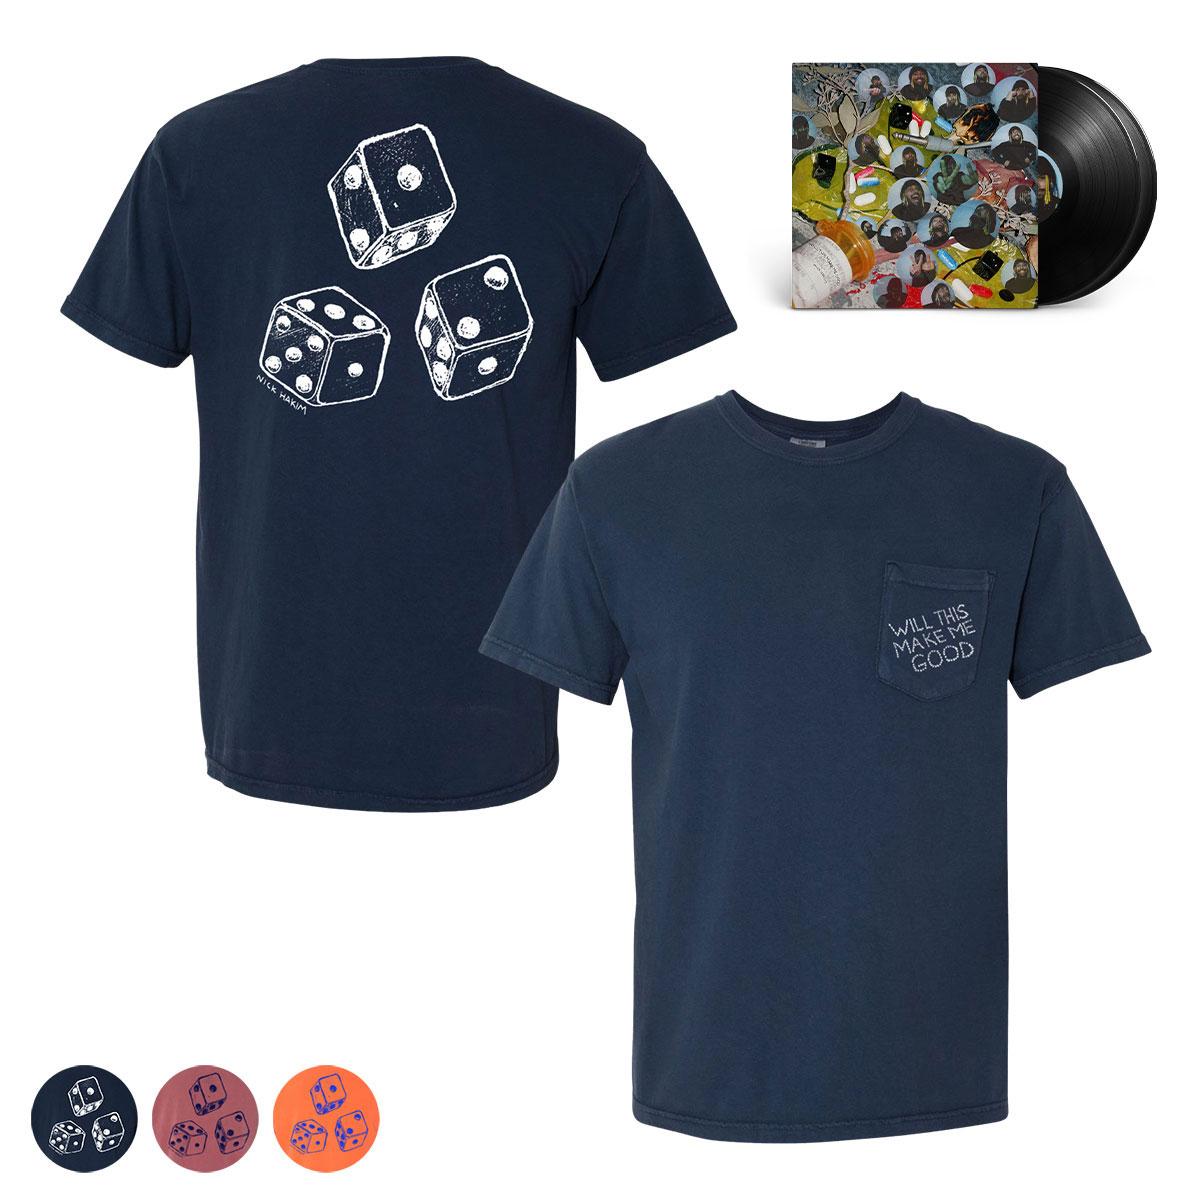 Nick Hakim - WILL THIS MAKE ME GOOD Vinyl + T-Shirt